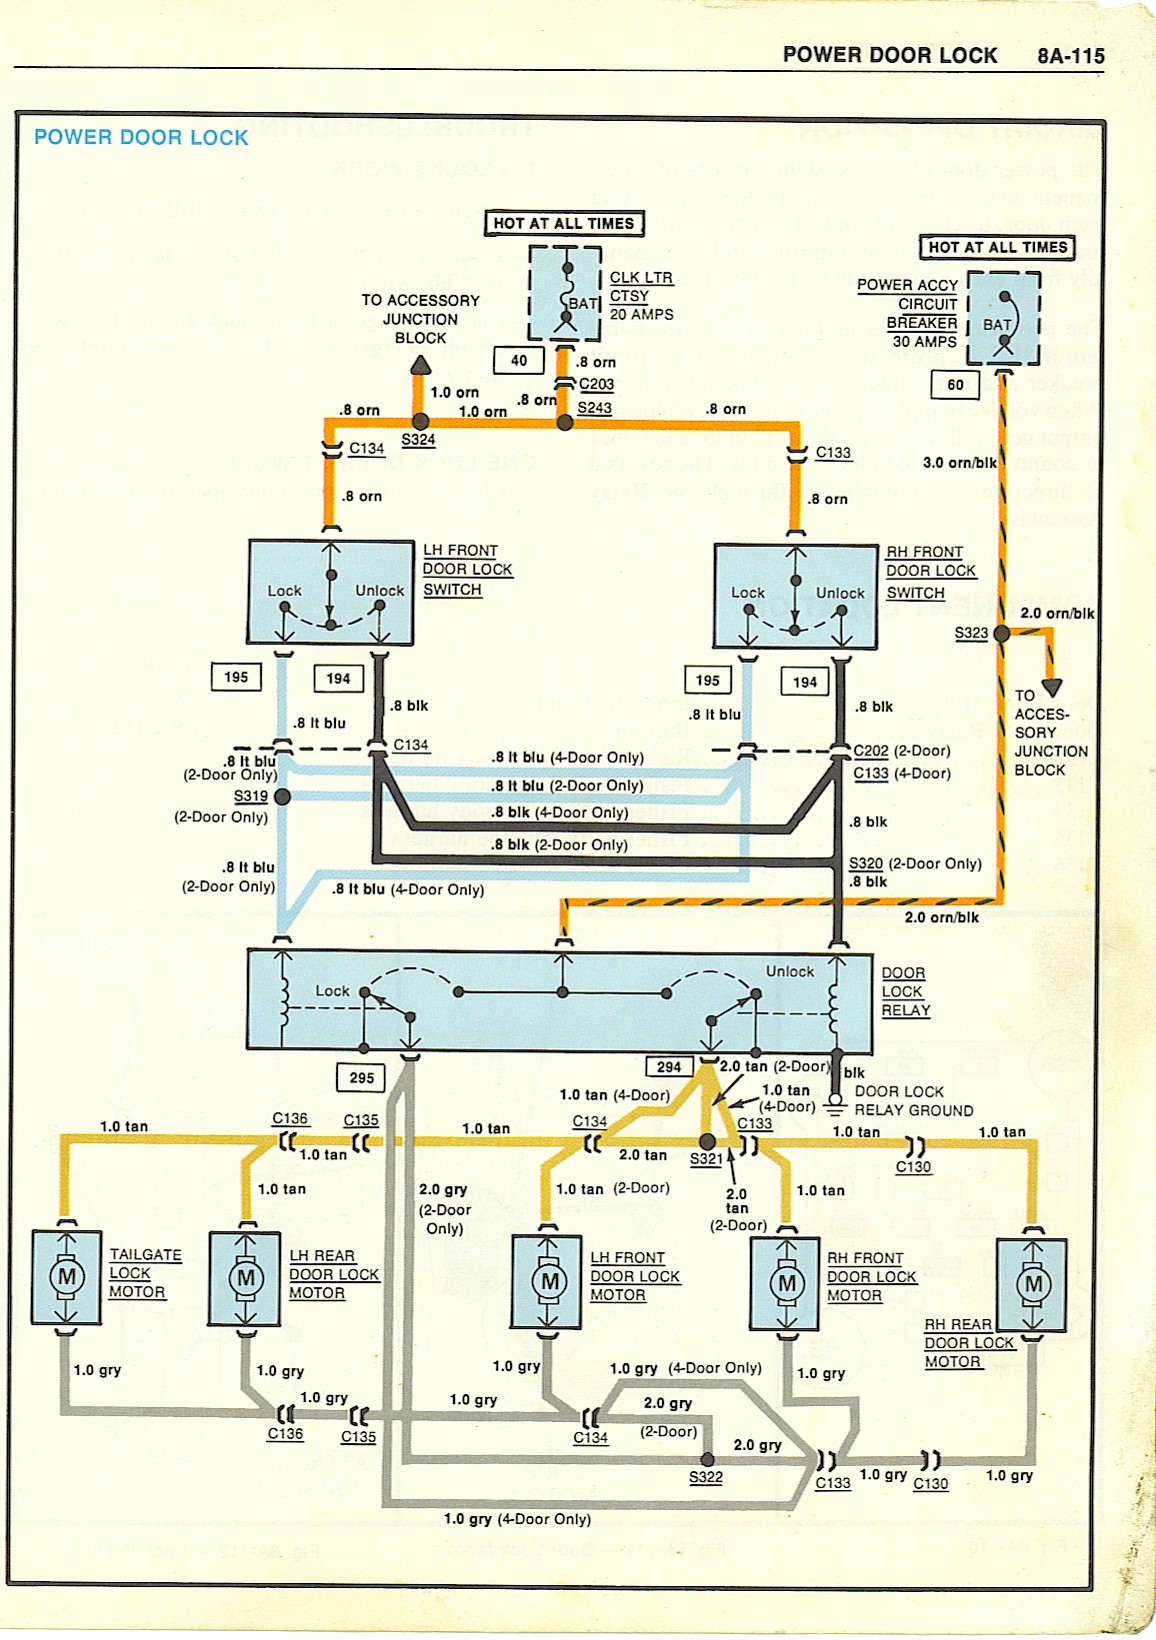 Pleasing 1980 Chevy Heater Wiring Wiring Diagram Wiring Cloud Rineaidewilluminateatxorg